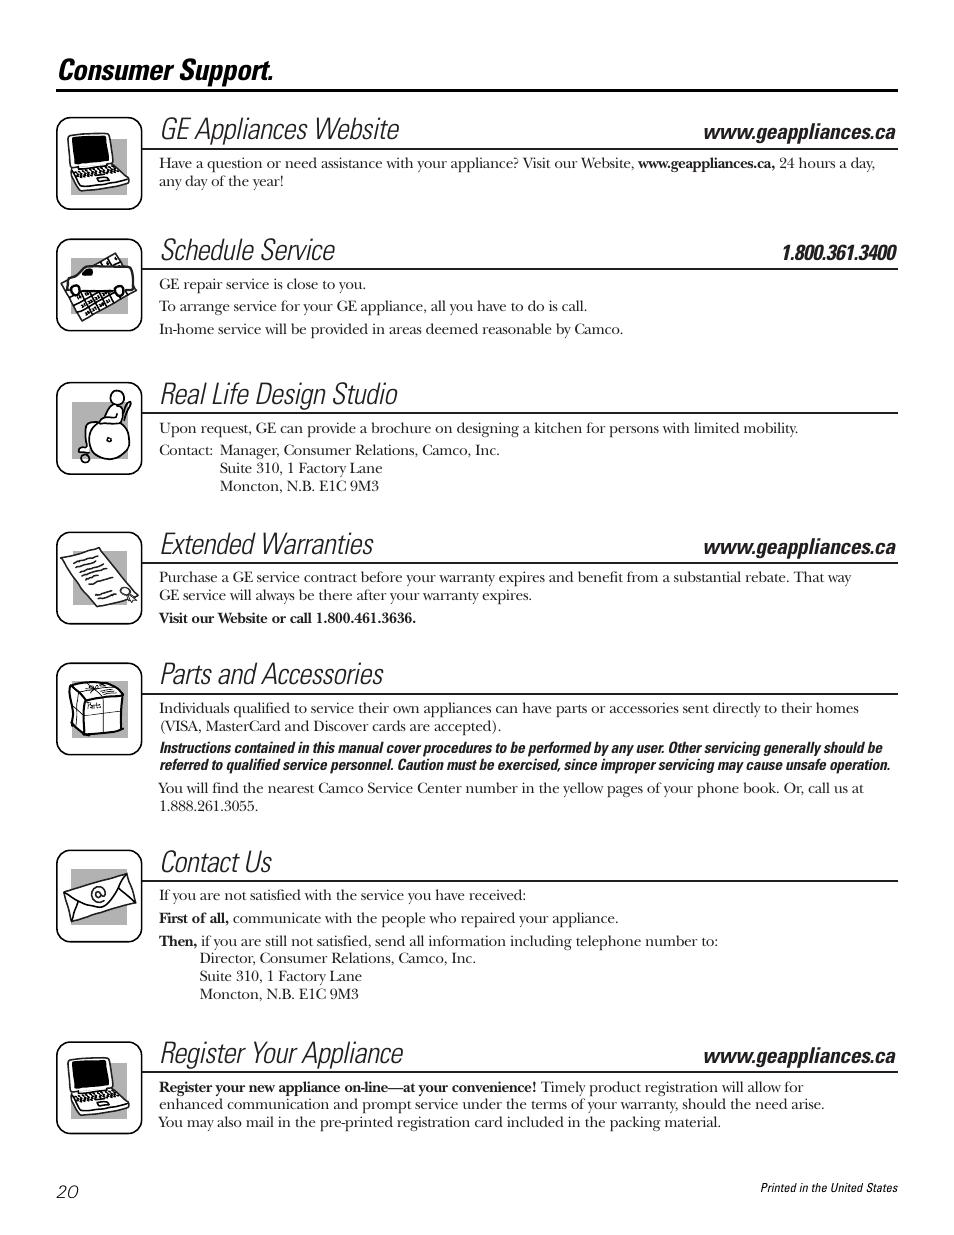 ge appliances website schedule service real life design studio rh manualsdir com Maytag Appliance Manuals KitchenAid Appliance Manuals